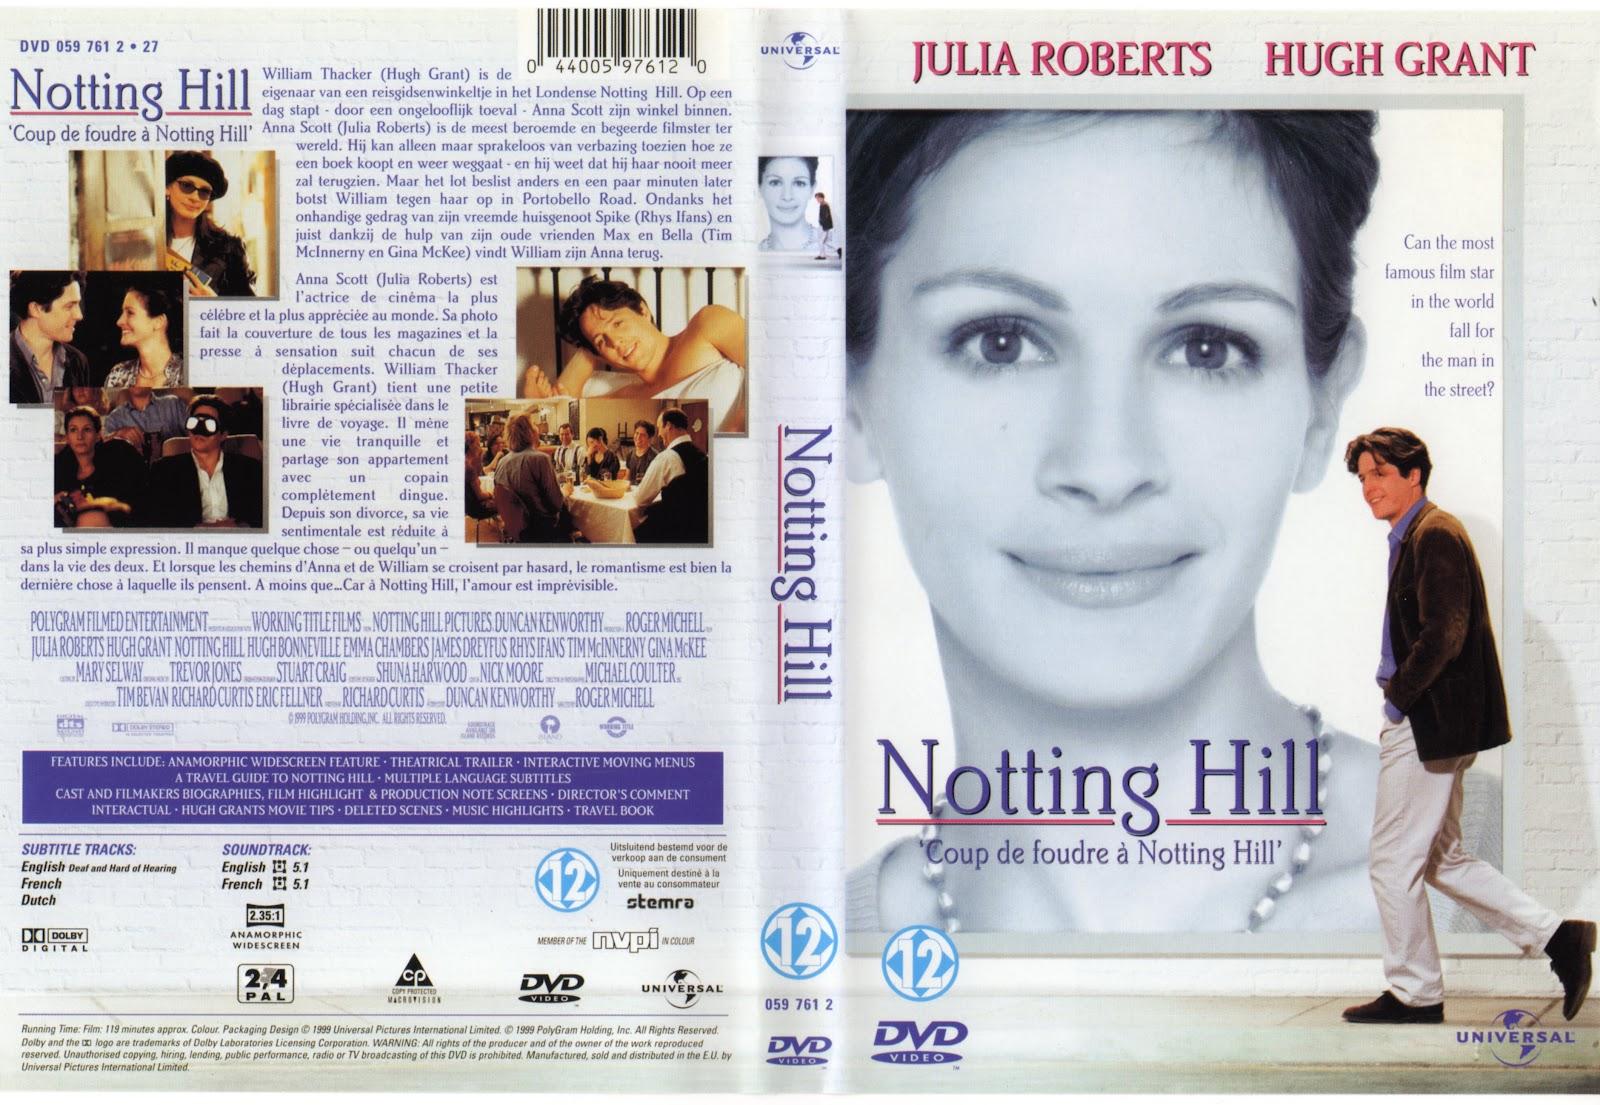 http://3.bp.blogspot.com/-YmaLHi9GLPs/T3eCu4A4meI/AAAAAAAAHoA/X8Hx7ZCbB28/s1600/Coup_de_foudre_a_Notting_Hill-11372004062007.jpg